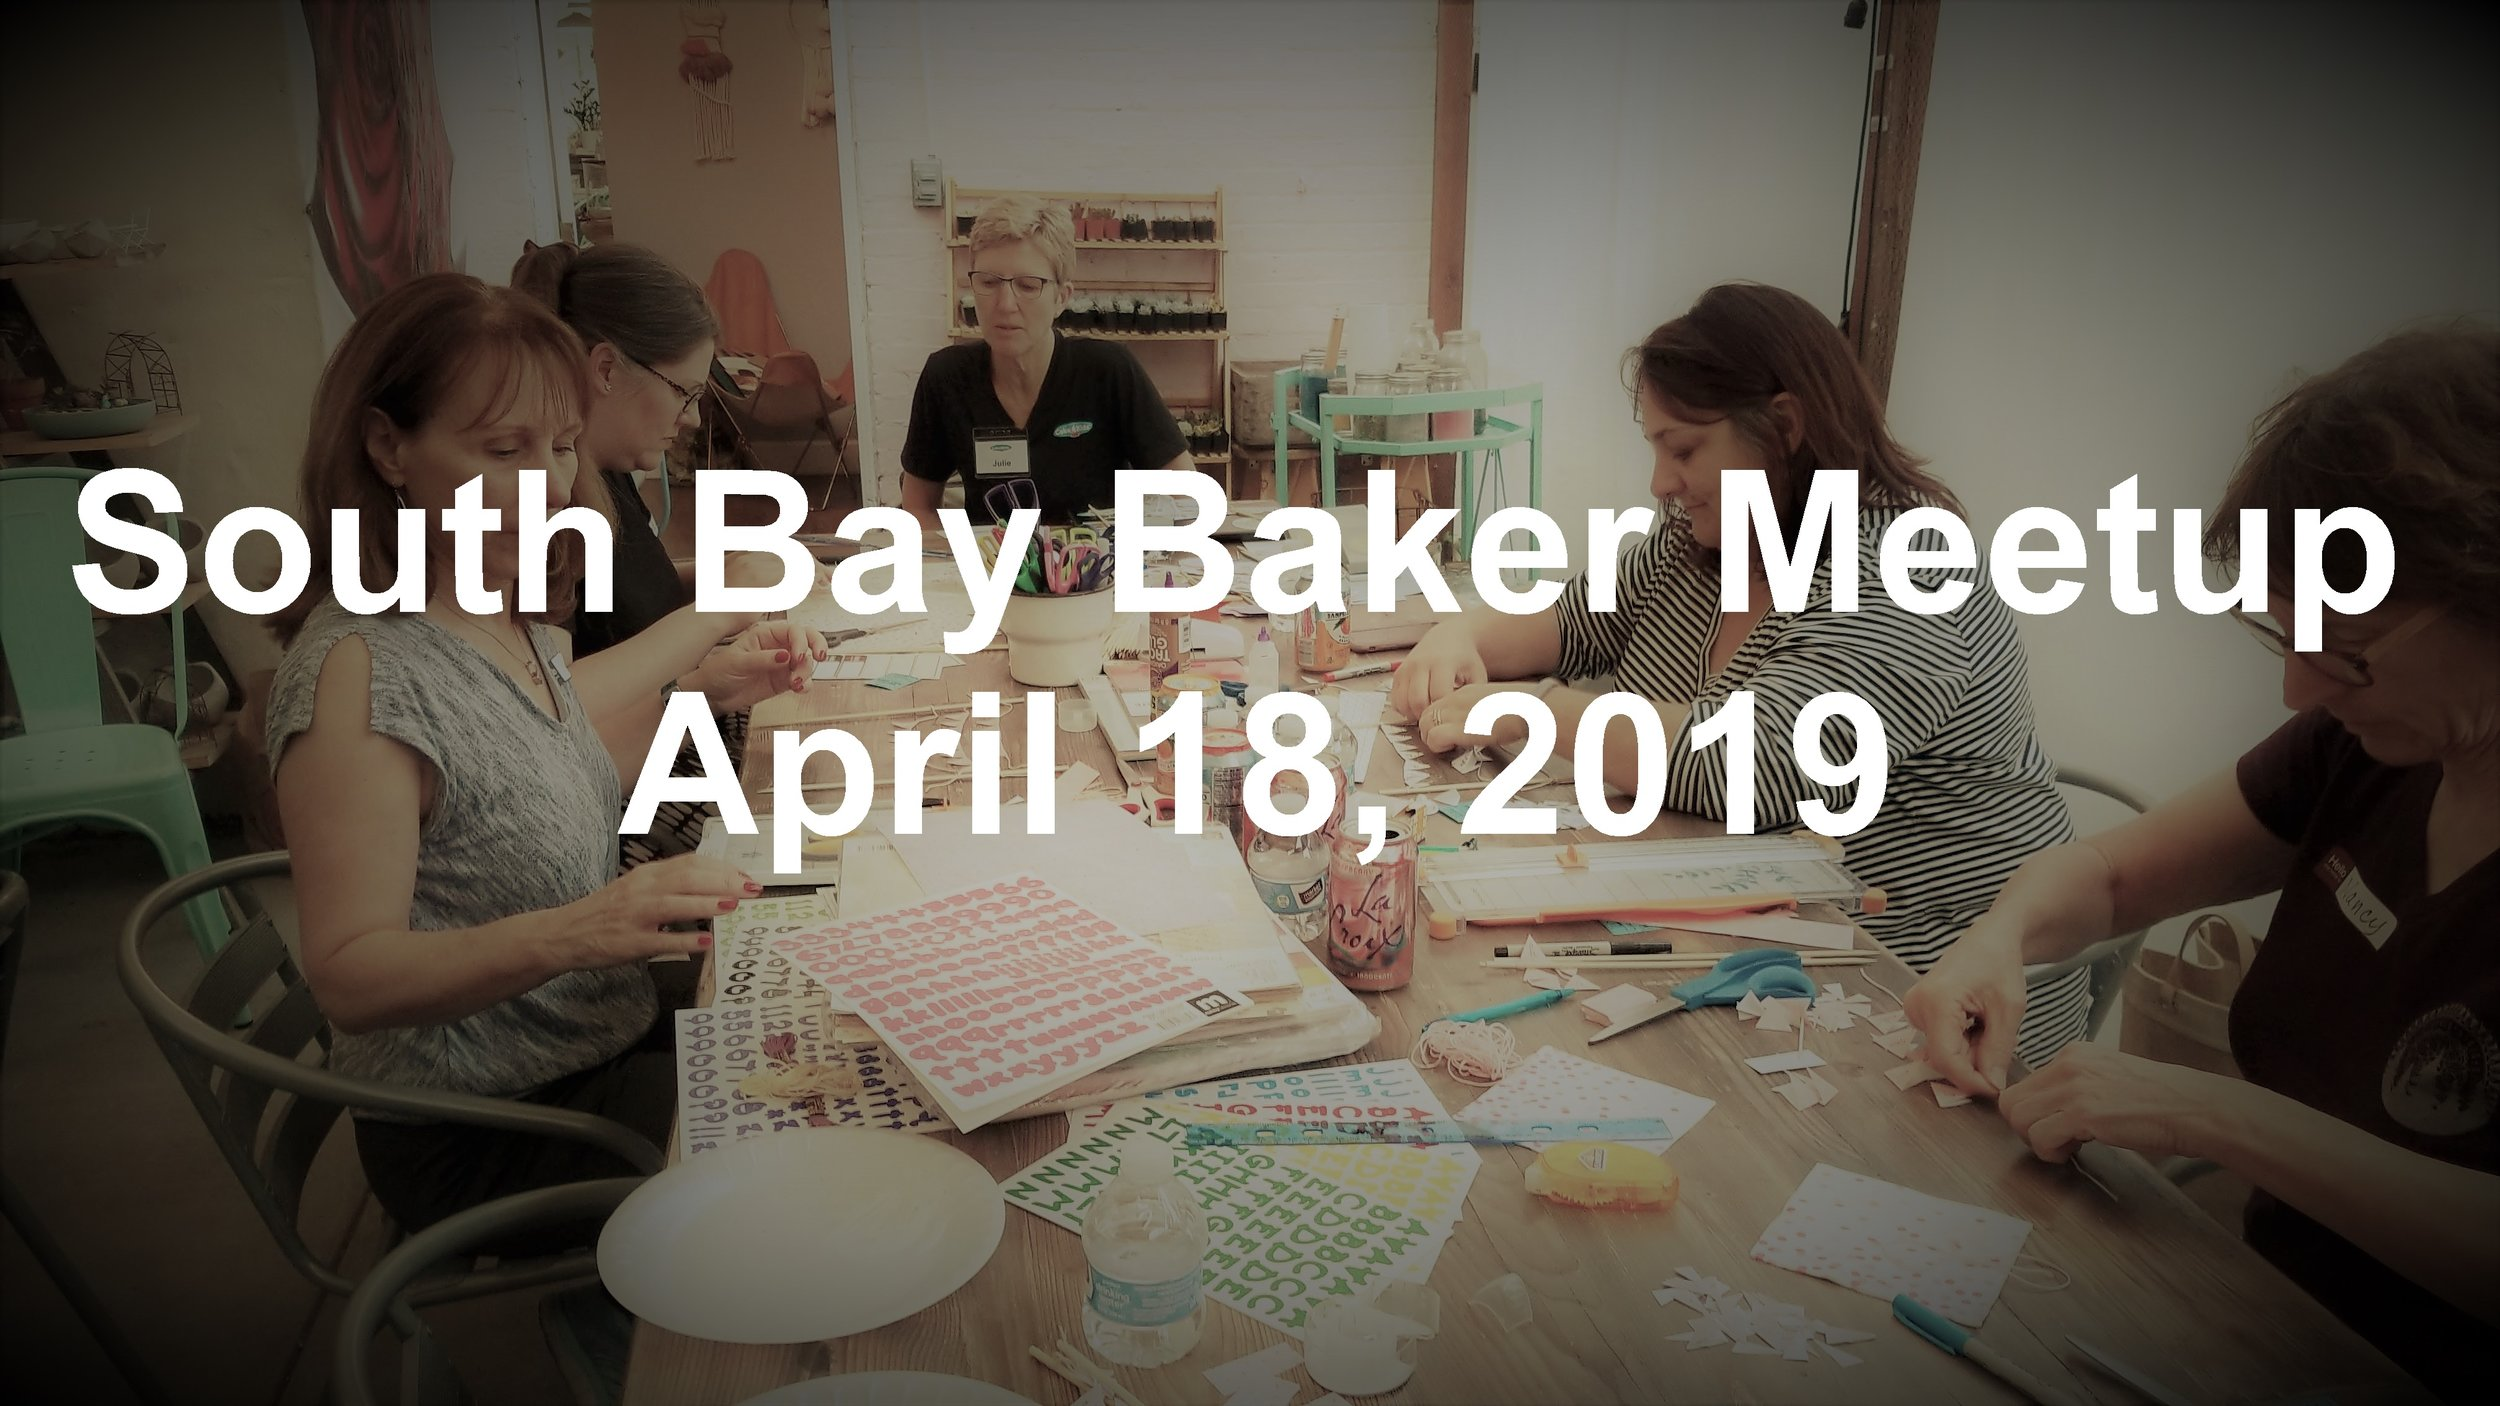 South Bay Baker Meetup Album Cover.jpg